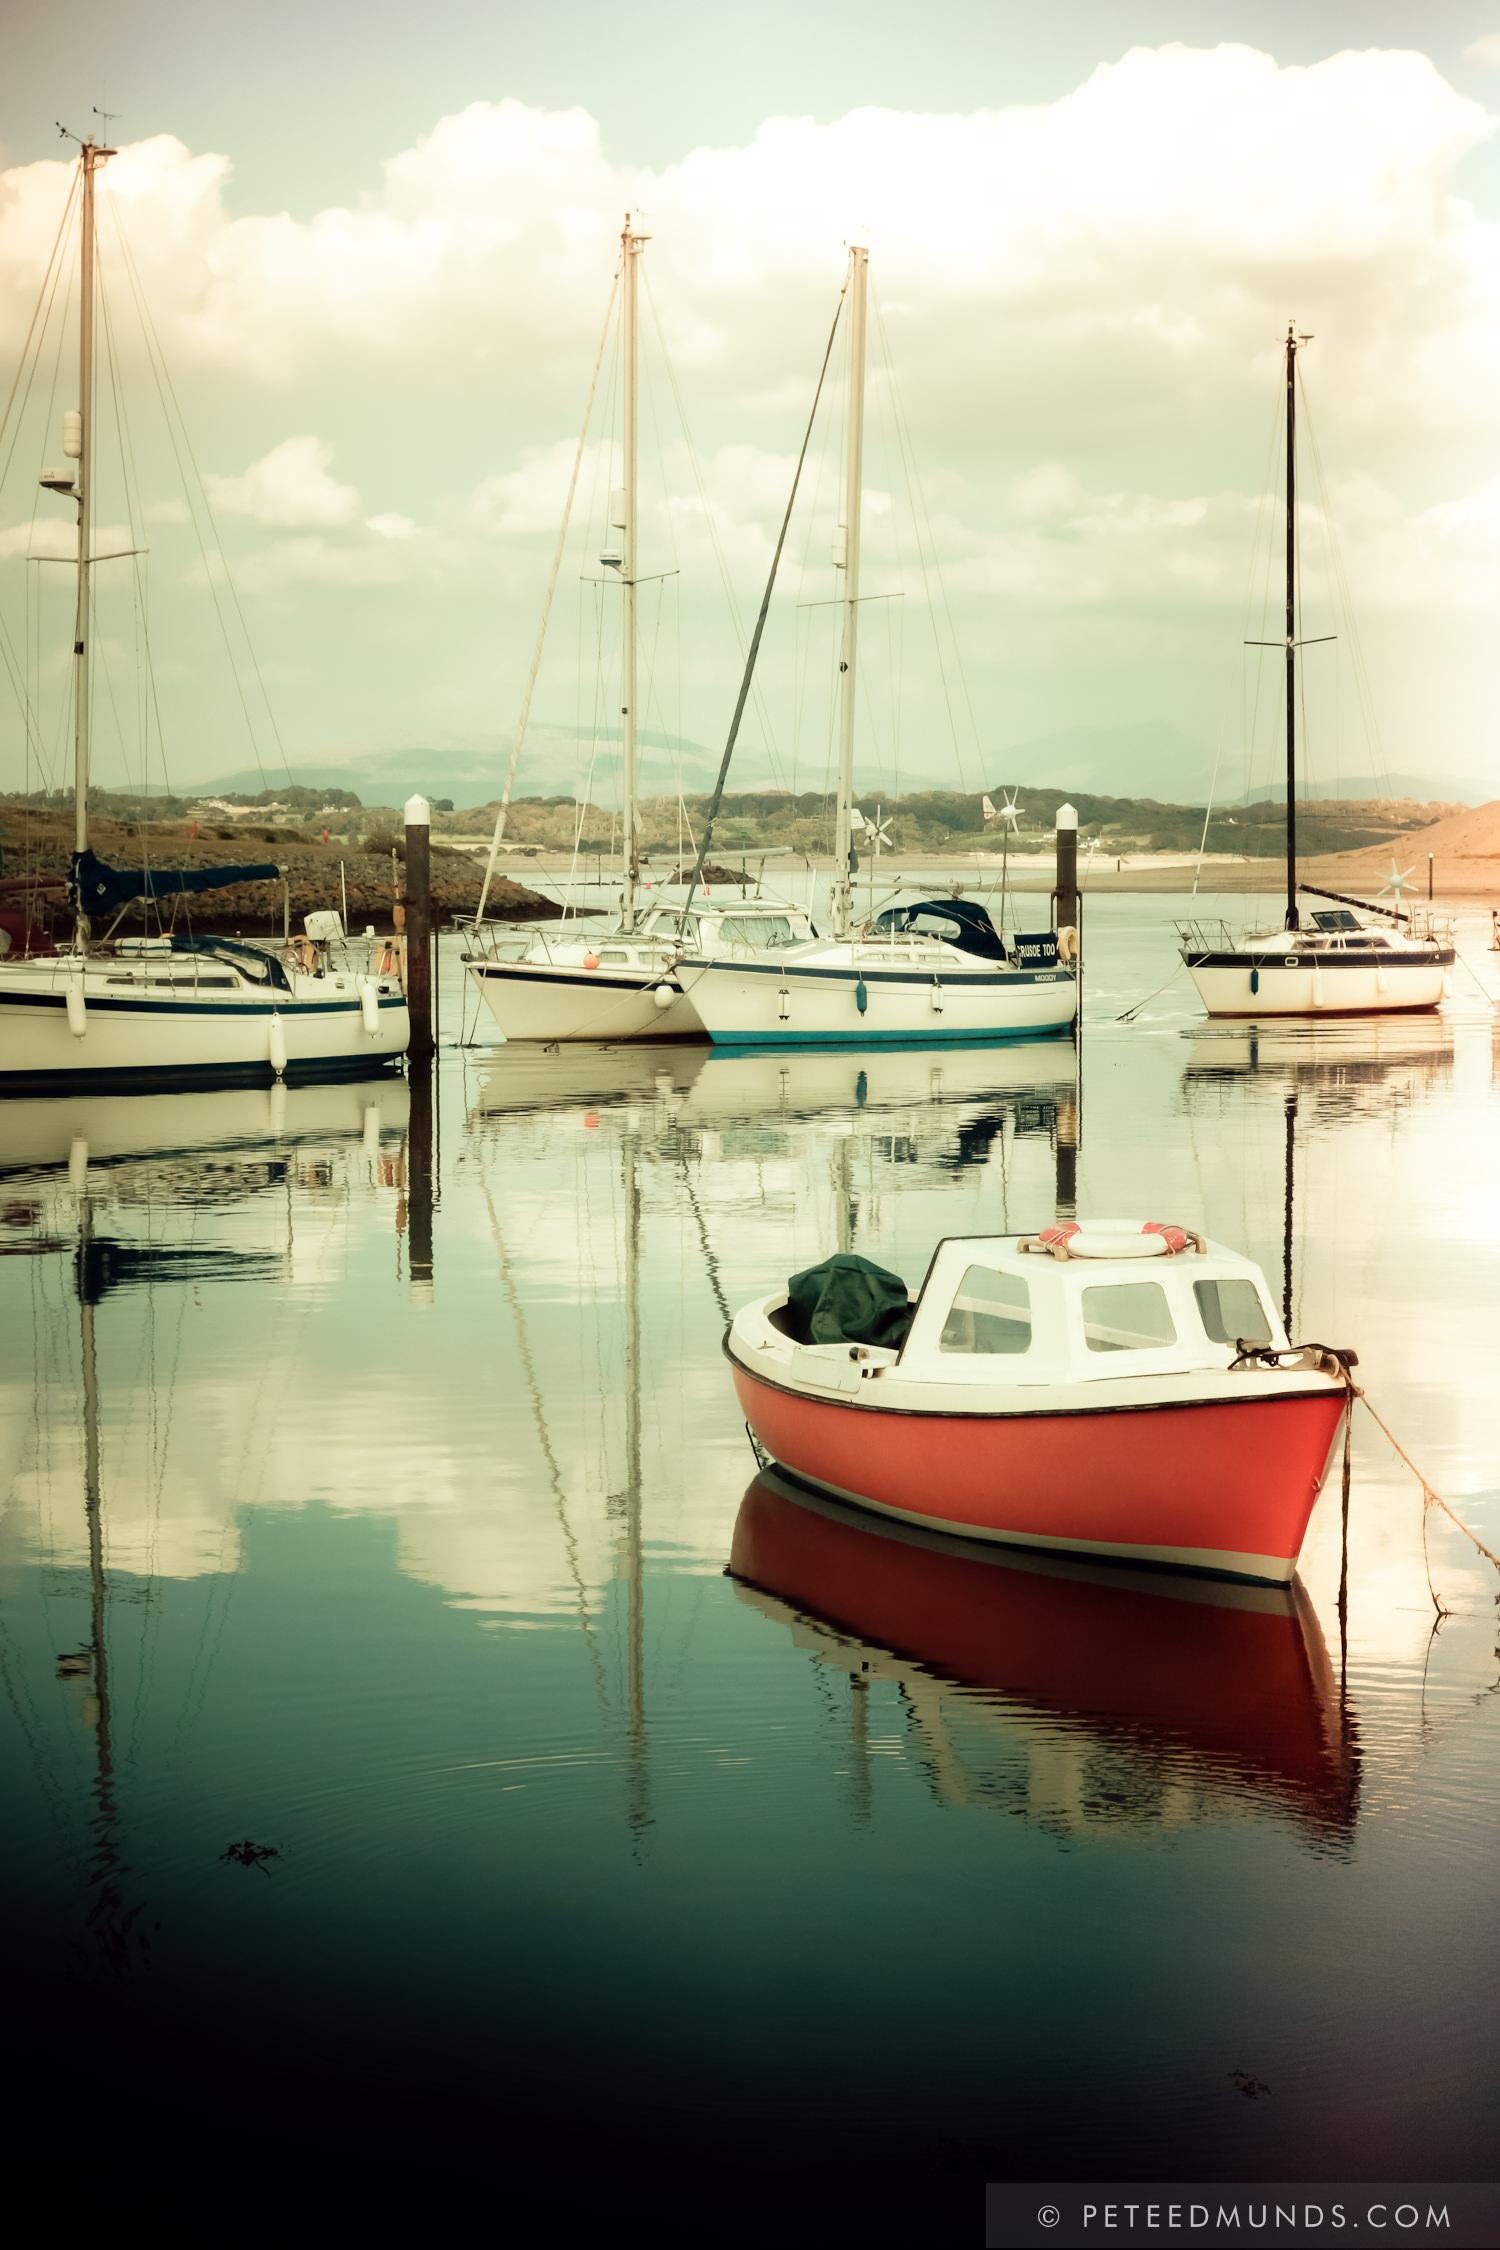 Little Orange Boat III